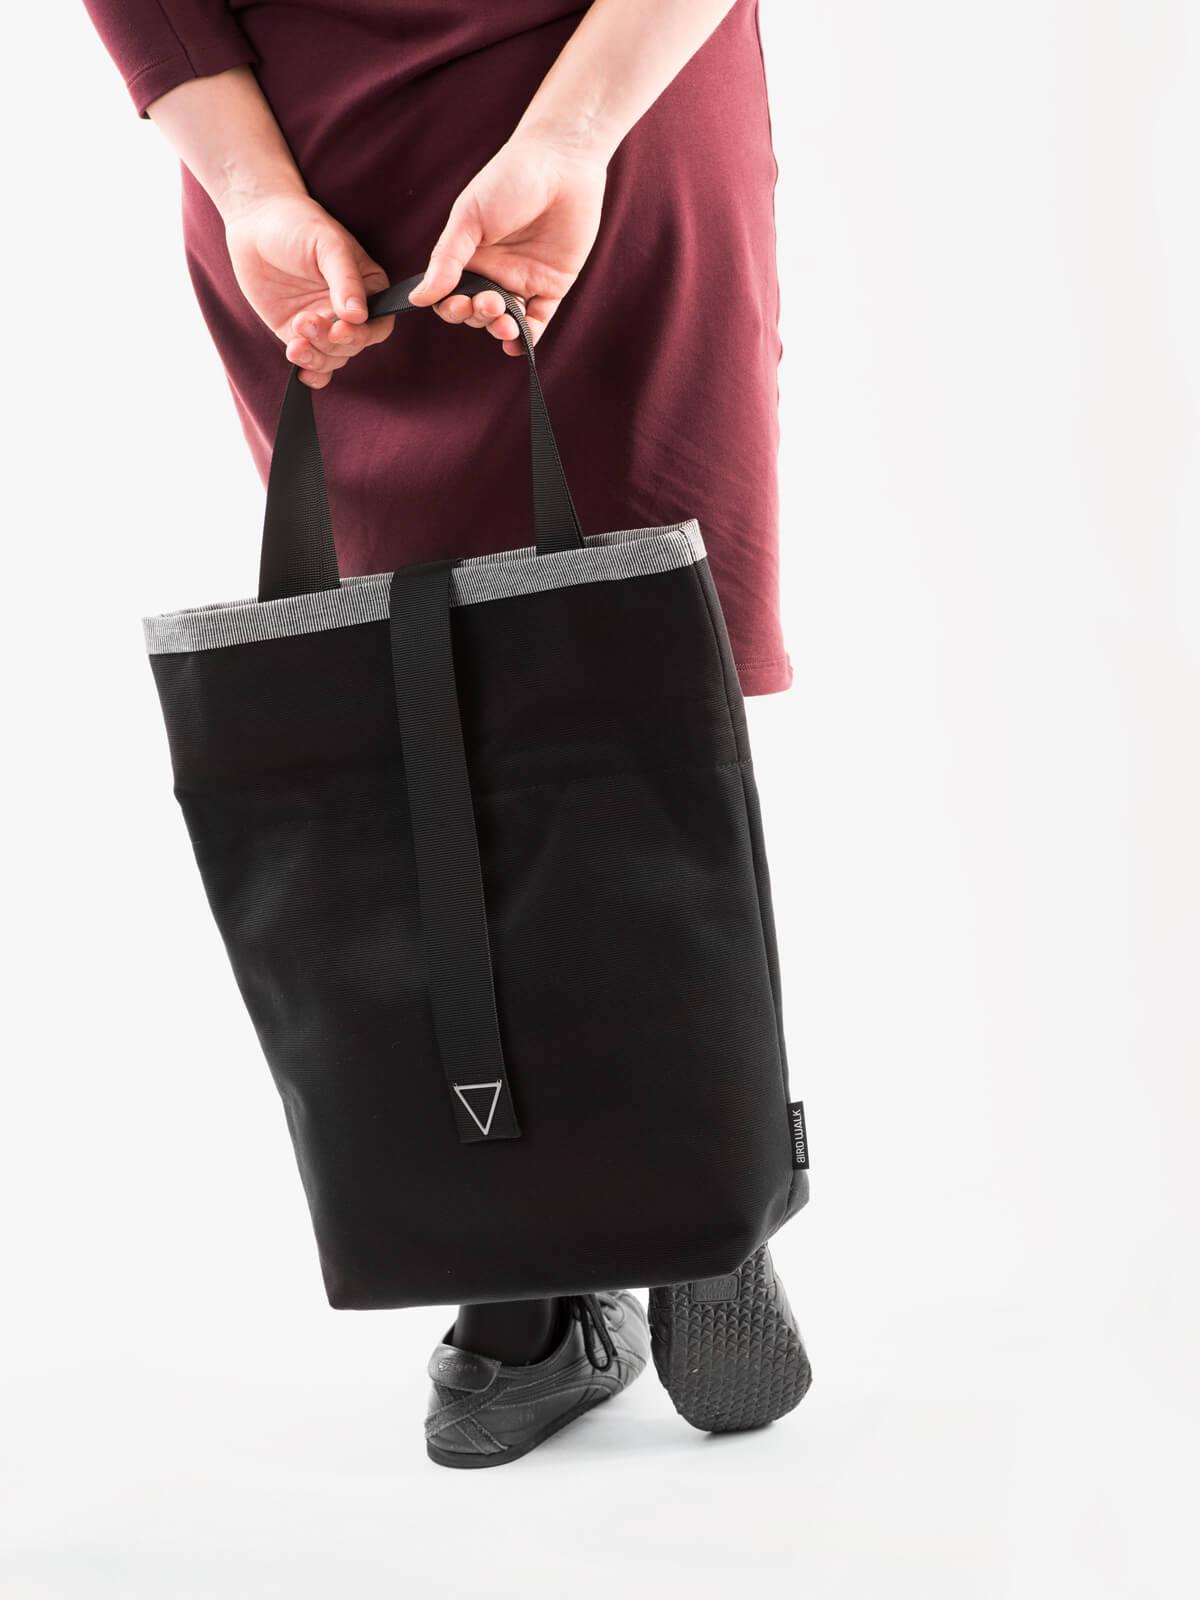 vegan sustainable organic cotton tote bag foldable to handbag Portugal